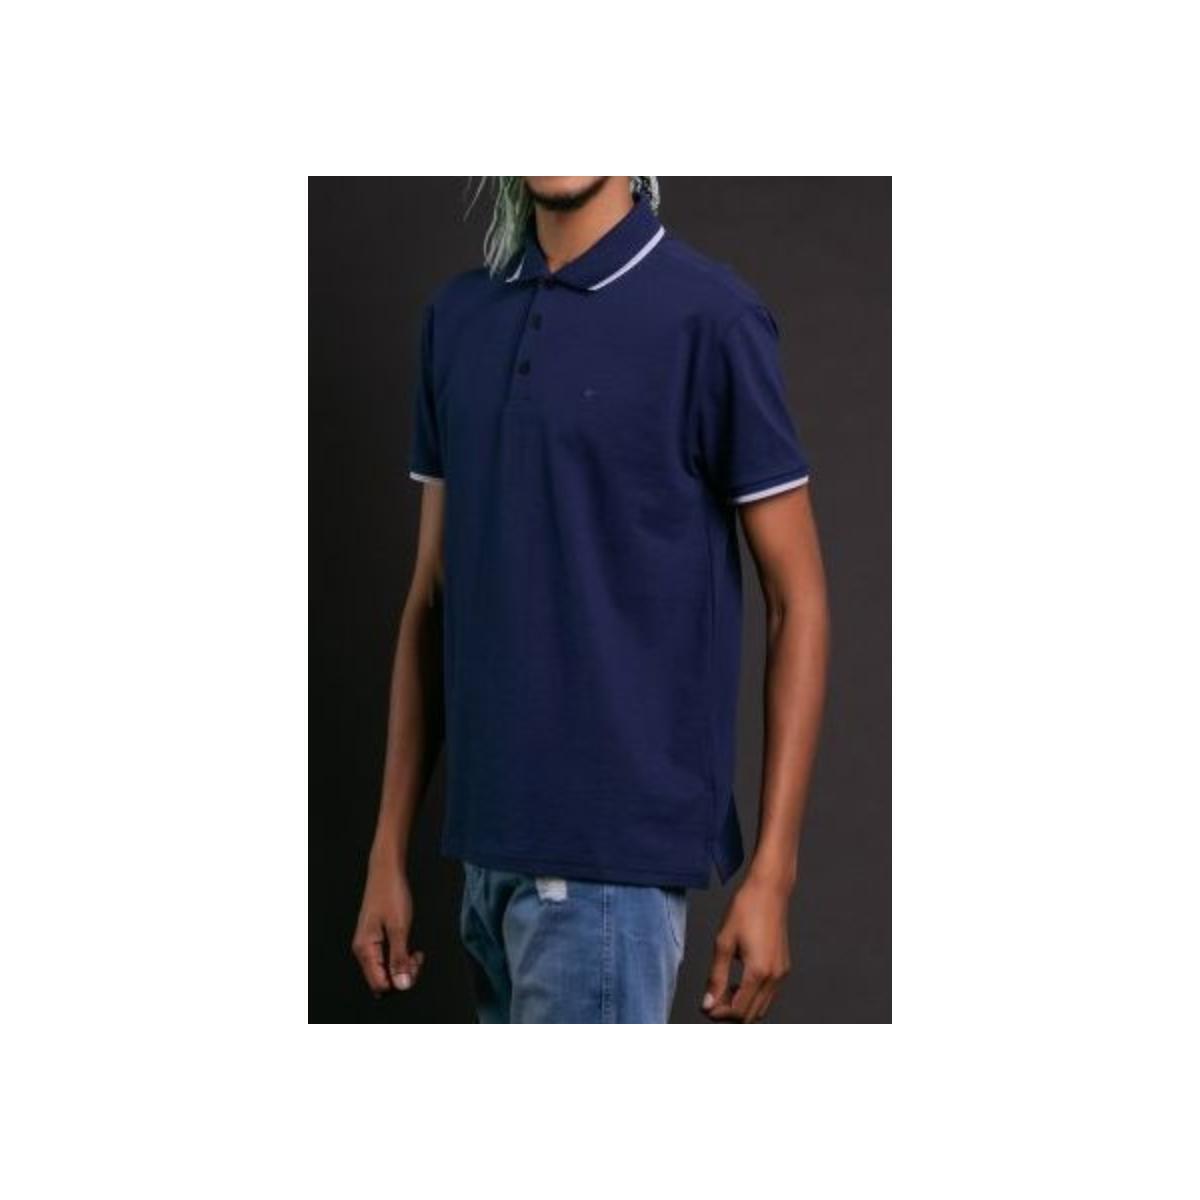 Camiseta Masculina Ellus B672 14 Marinho